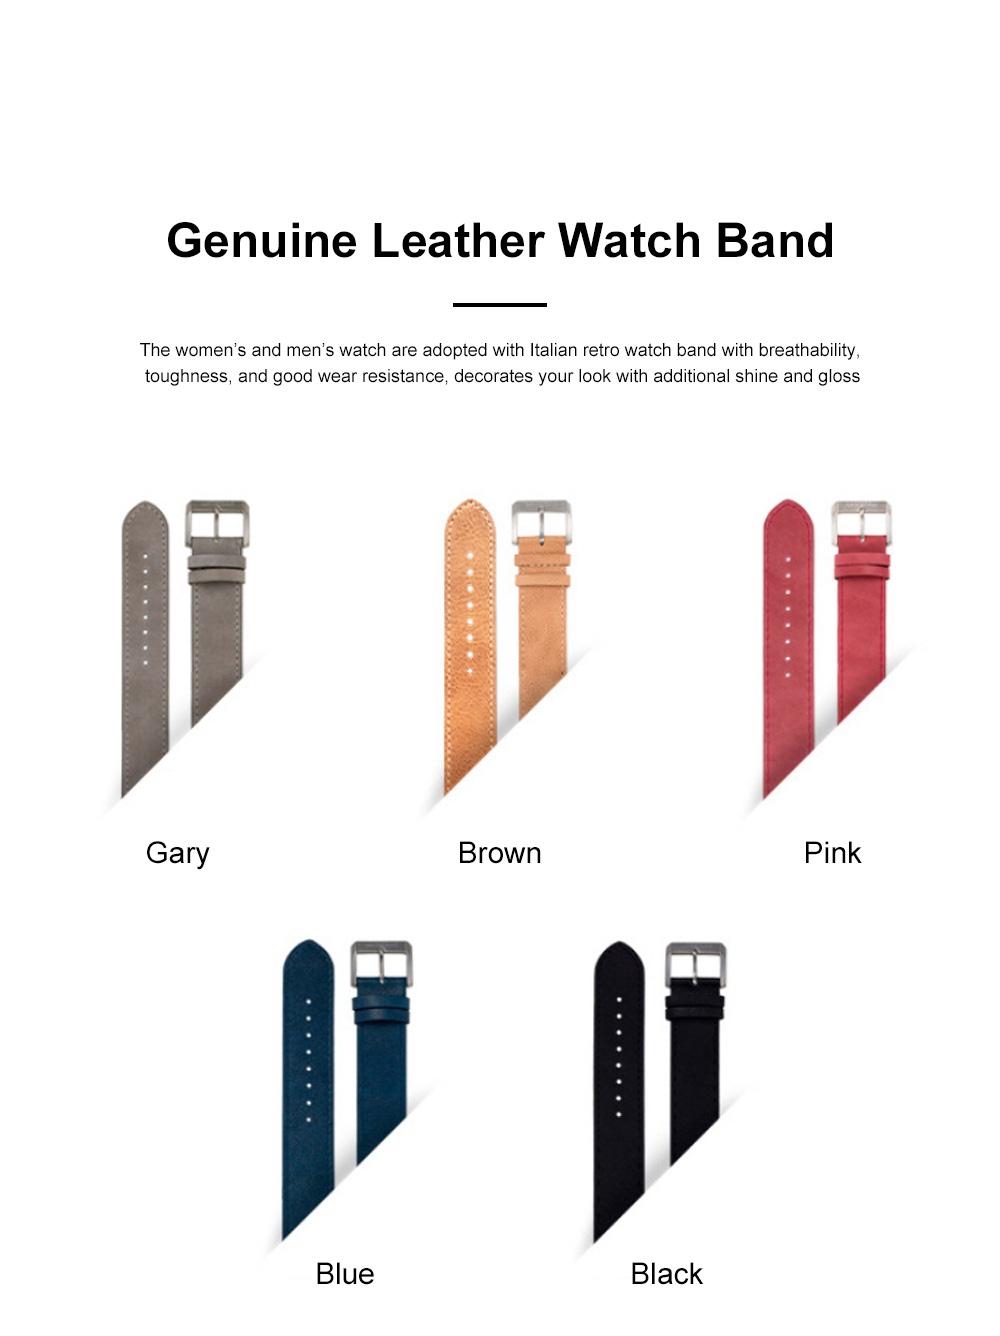 Lovers Mechanical Watch Waterproof Leisure Fashion Wristwatch for Men Women Couple Watch Gift Leather Luminous Needle Vertical Movement 1